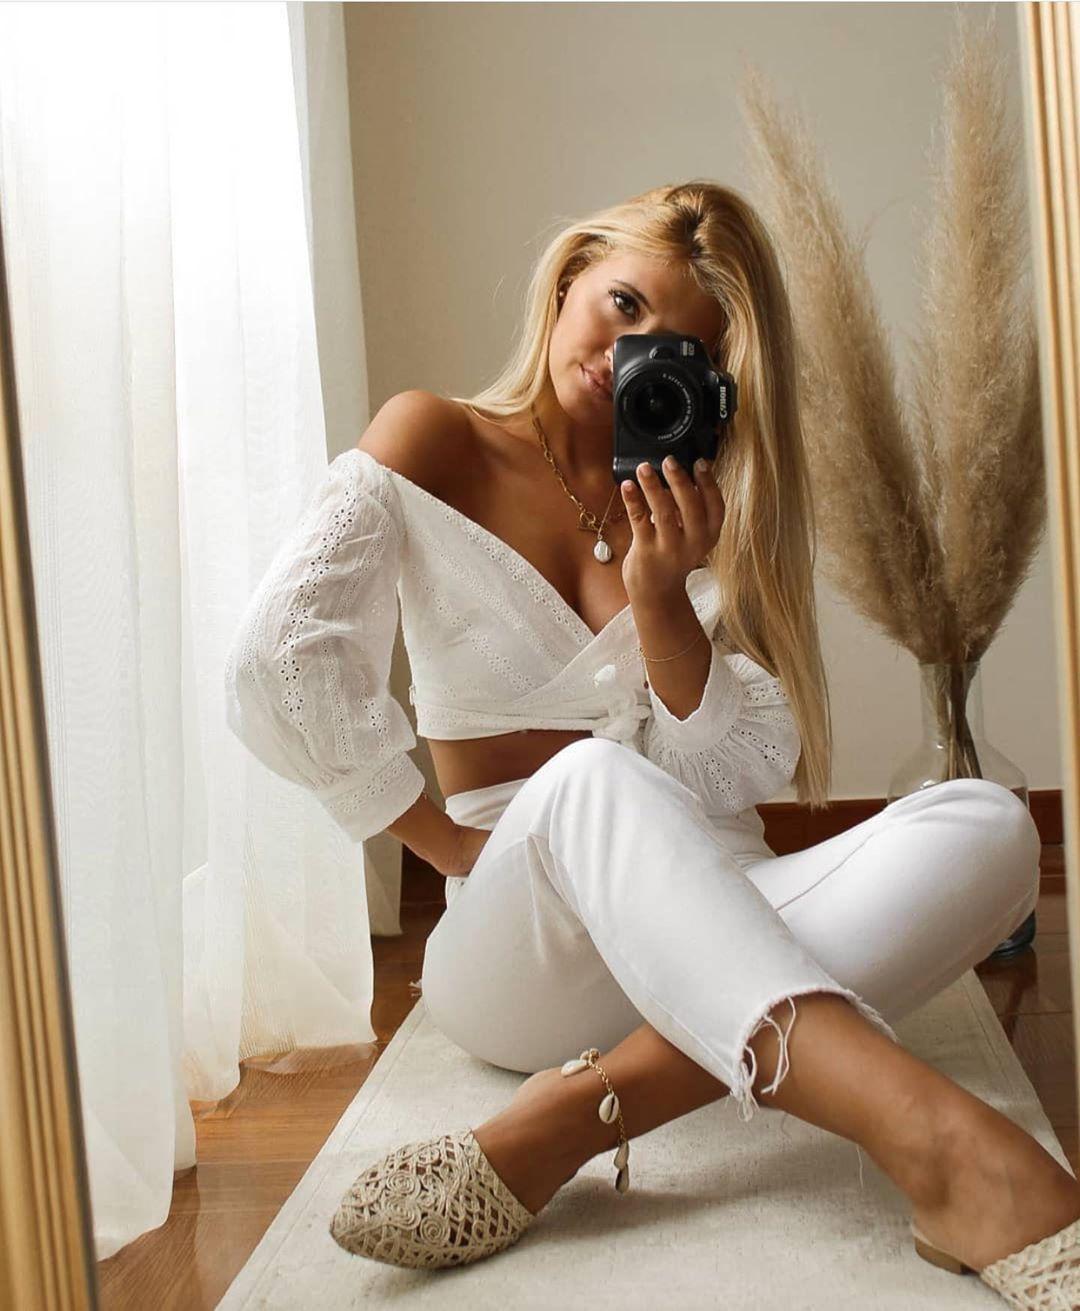 jean pantacourt flare taille normale de Zara sur zara.outfits